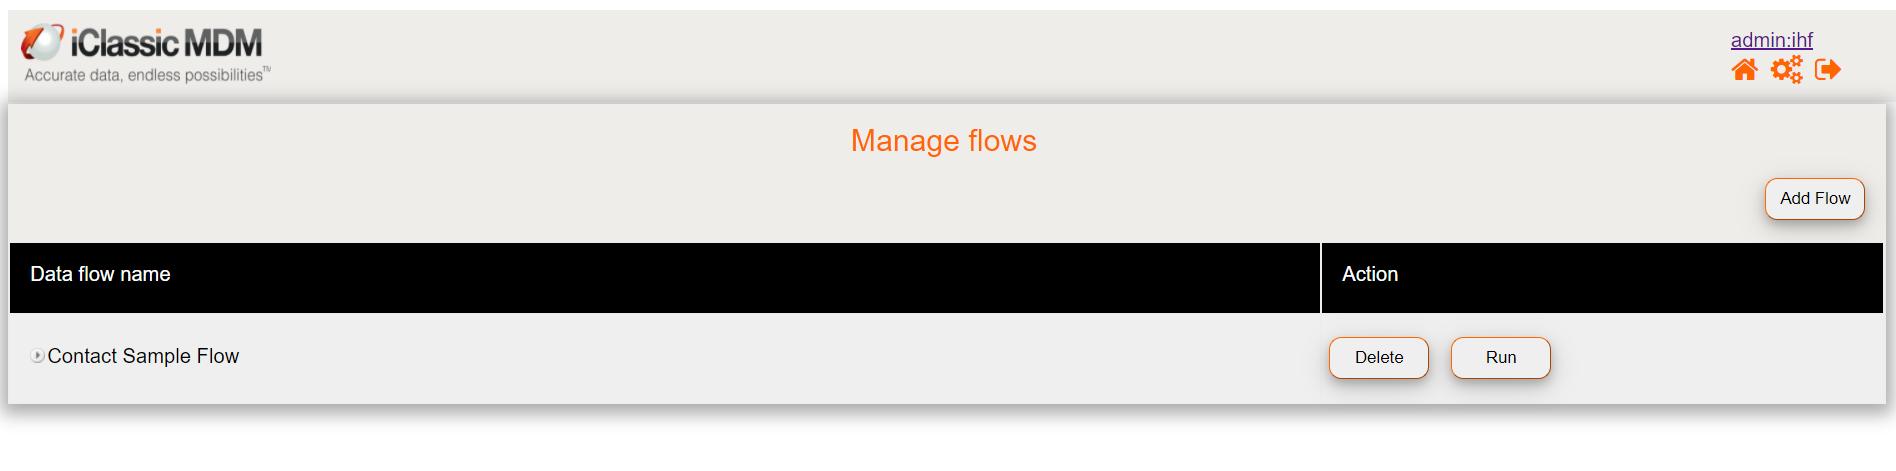 Data flow pipeline